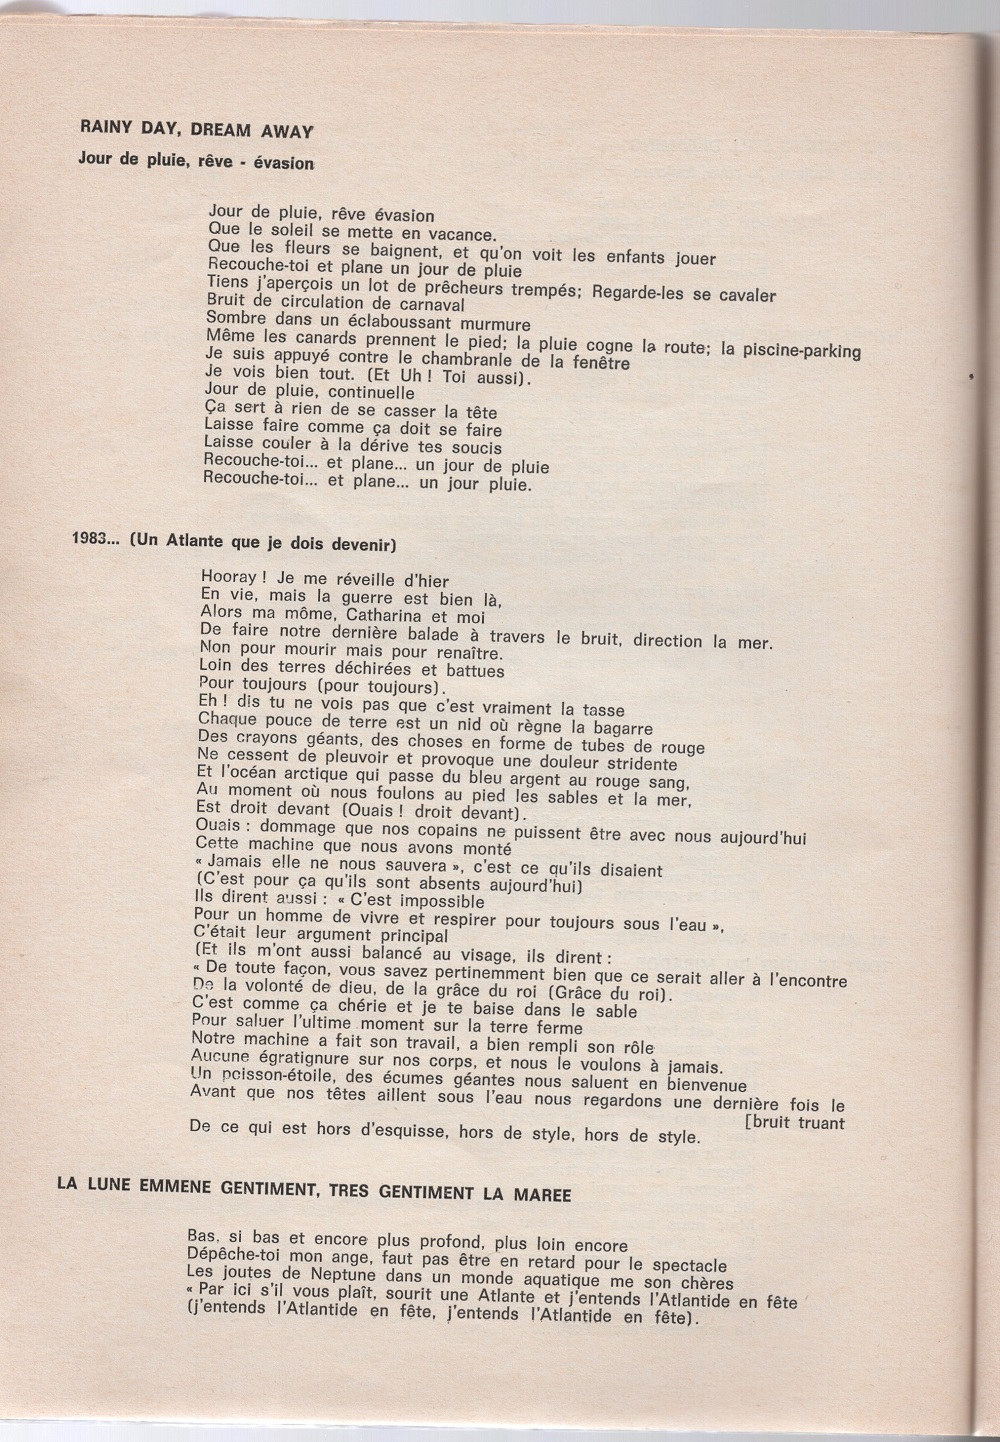 Curio Francais... Jimi Hendrix Songbook - Page 2 5610